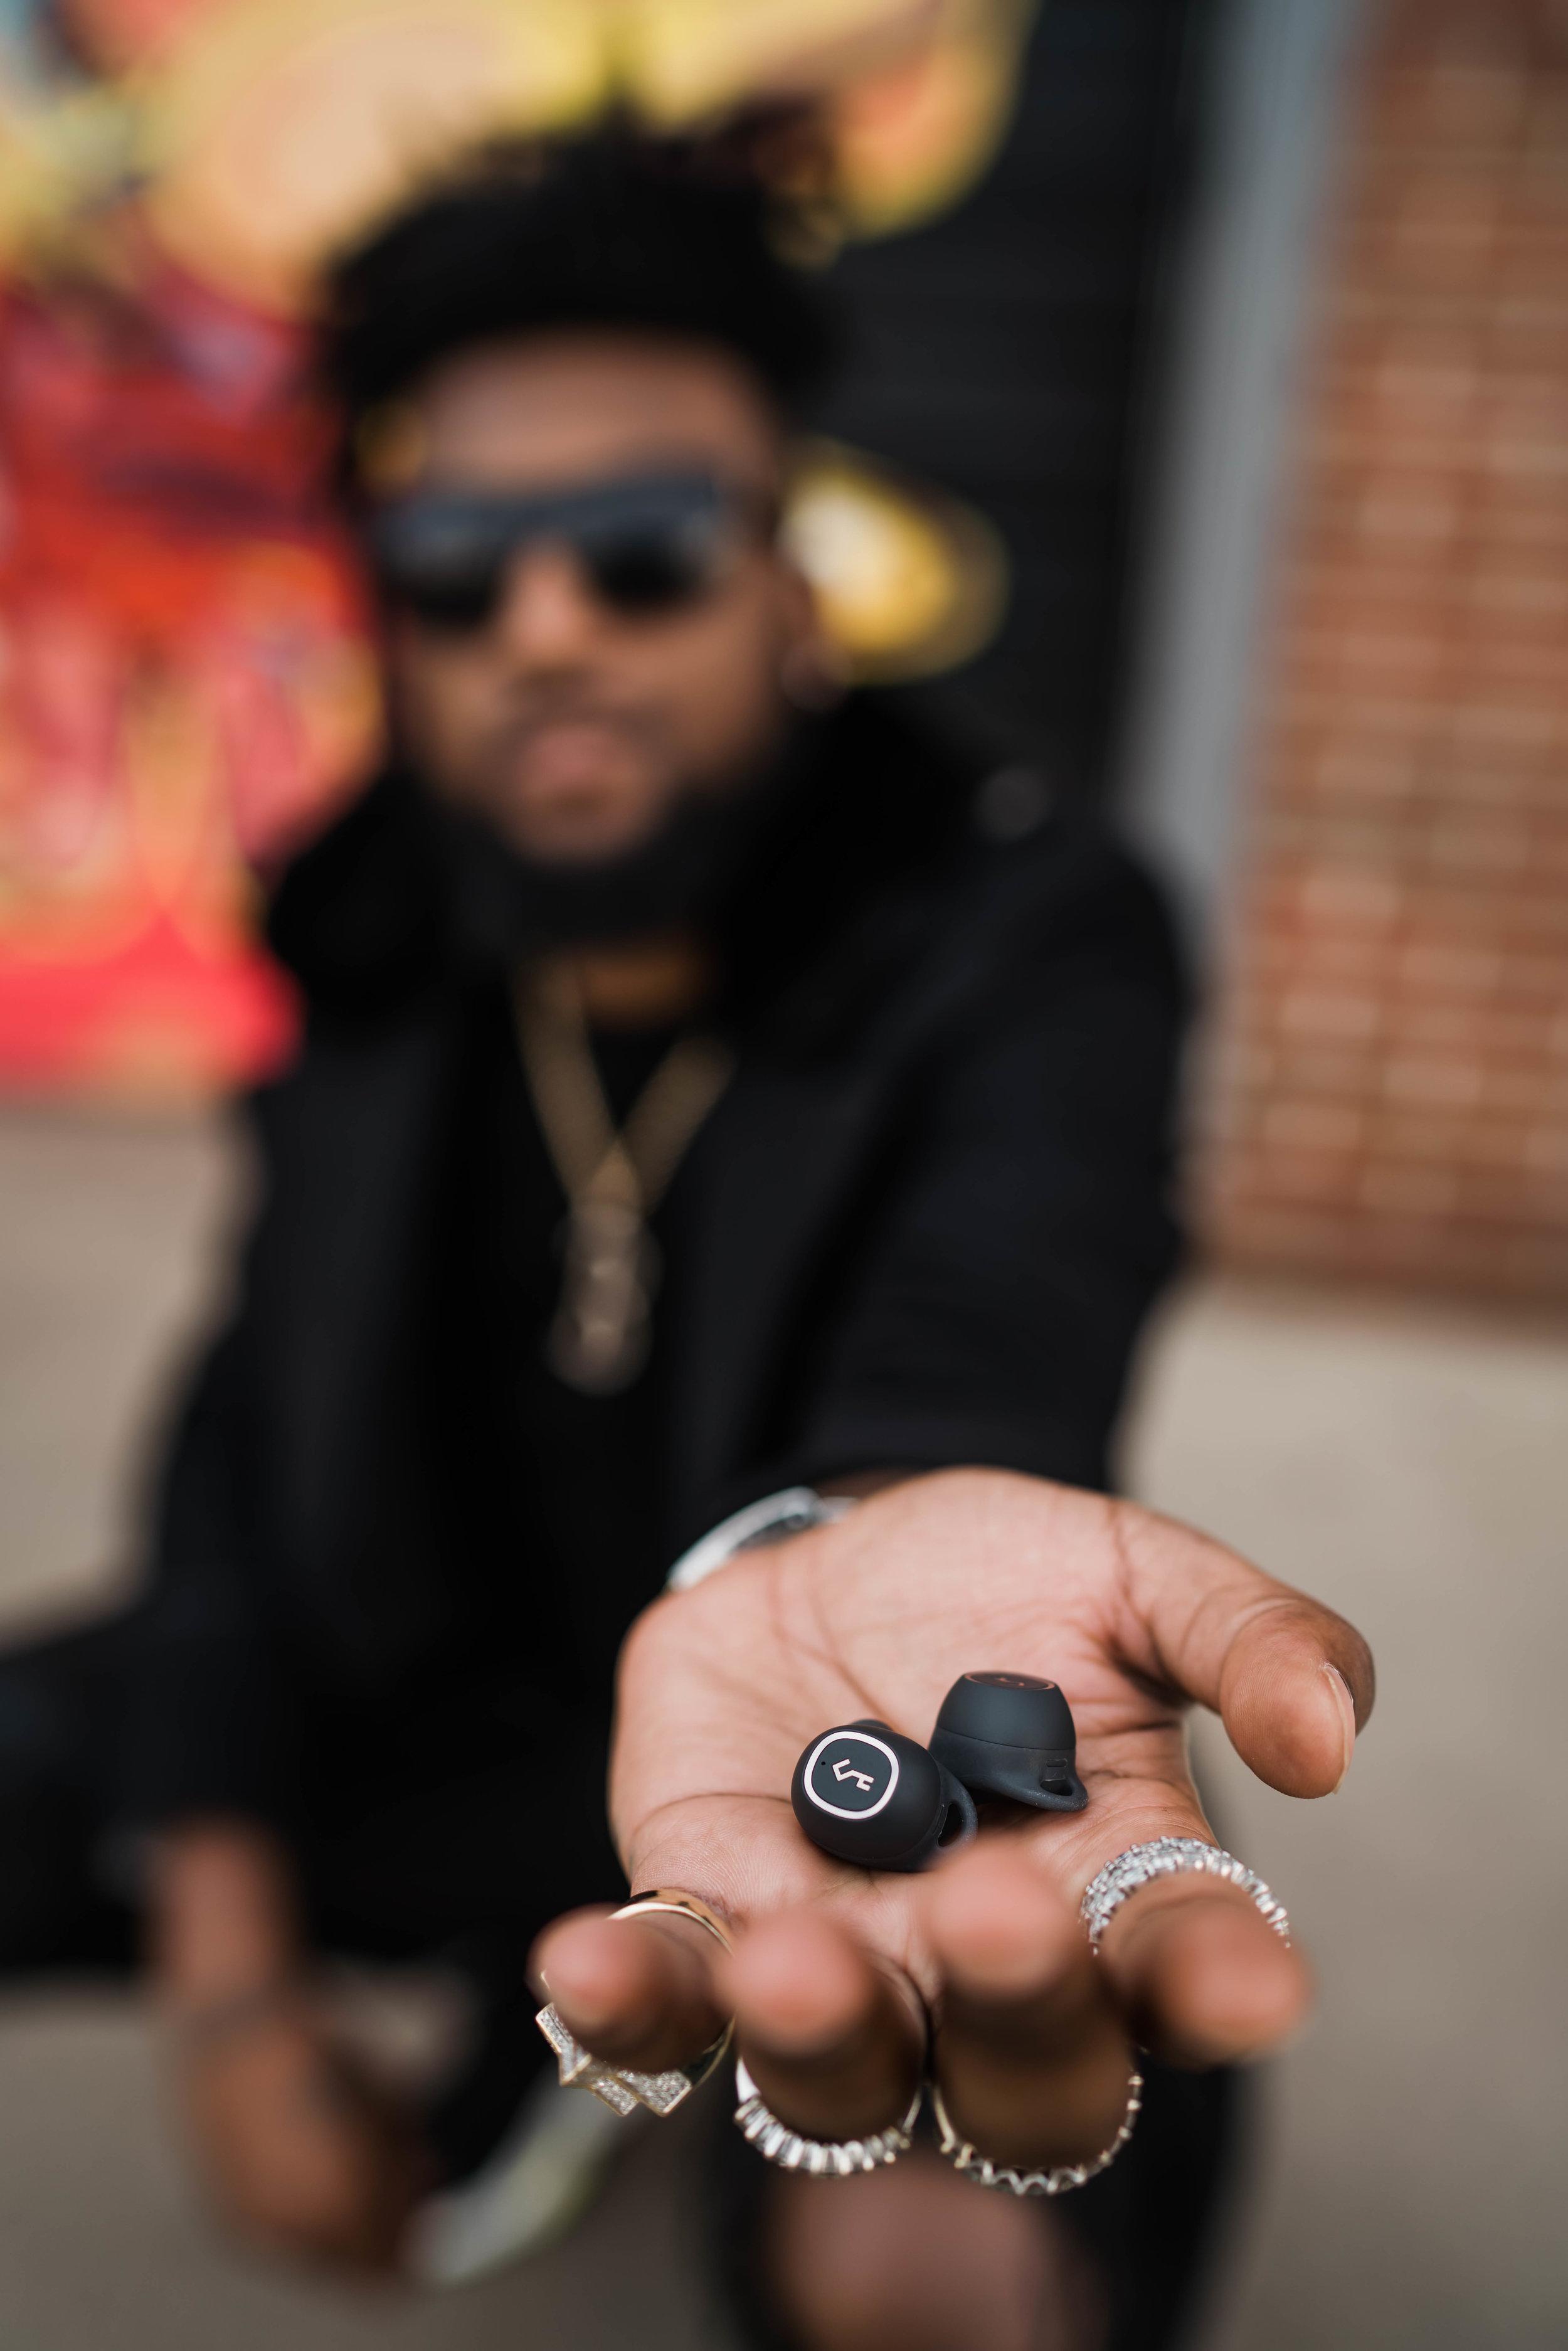 Denver commercial photographer with rapper famous kid brick celebrity photographer with headphones - DSC00624.jpg